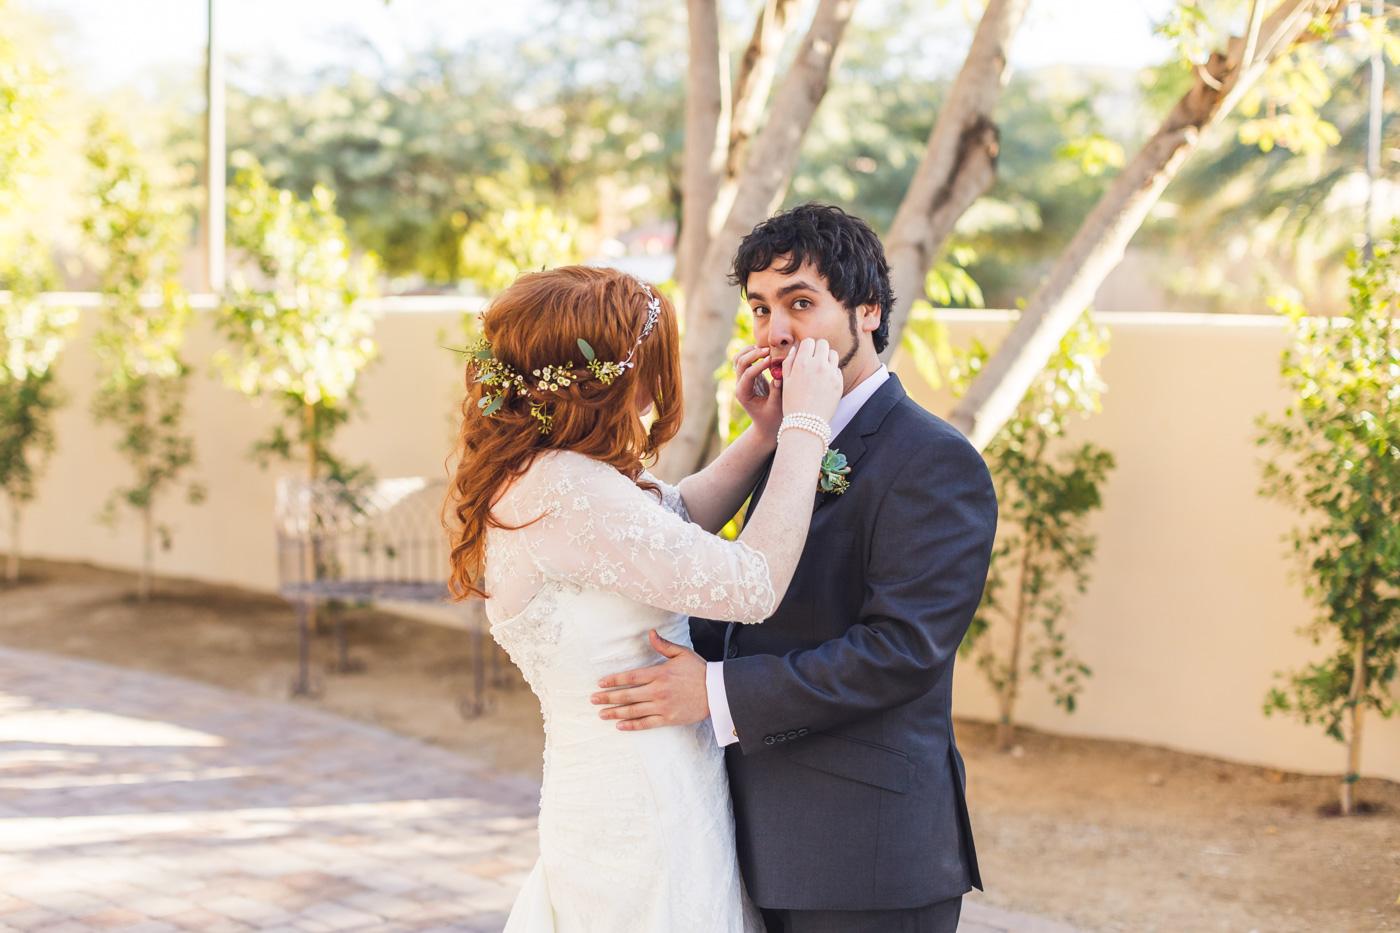 hilarious-groom-having-fun